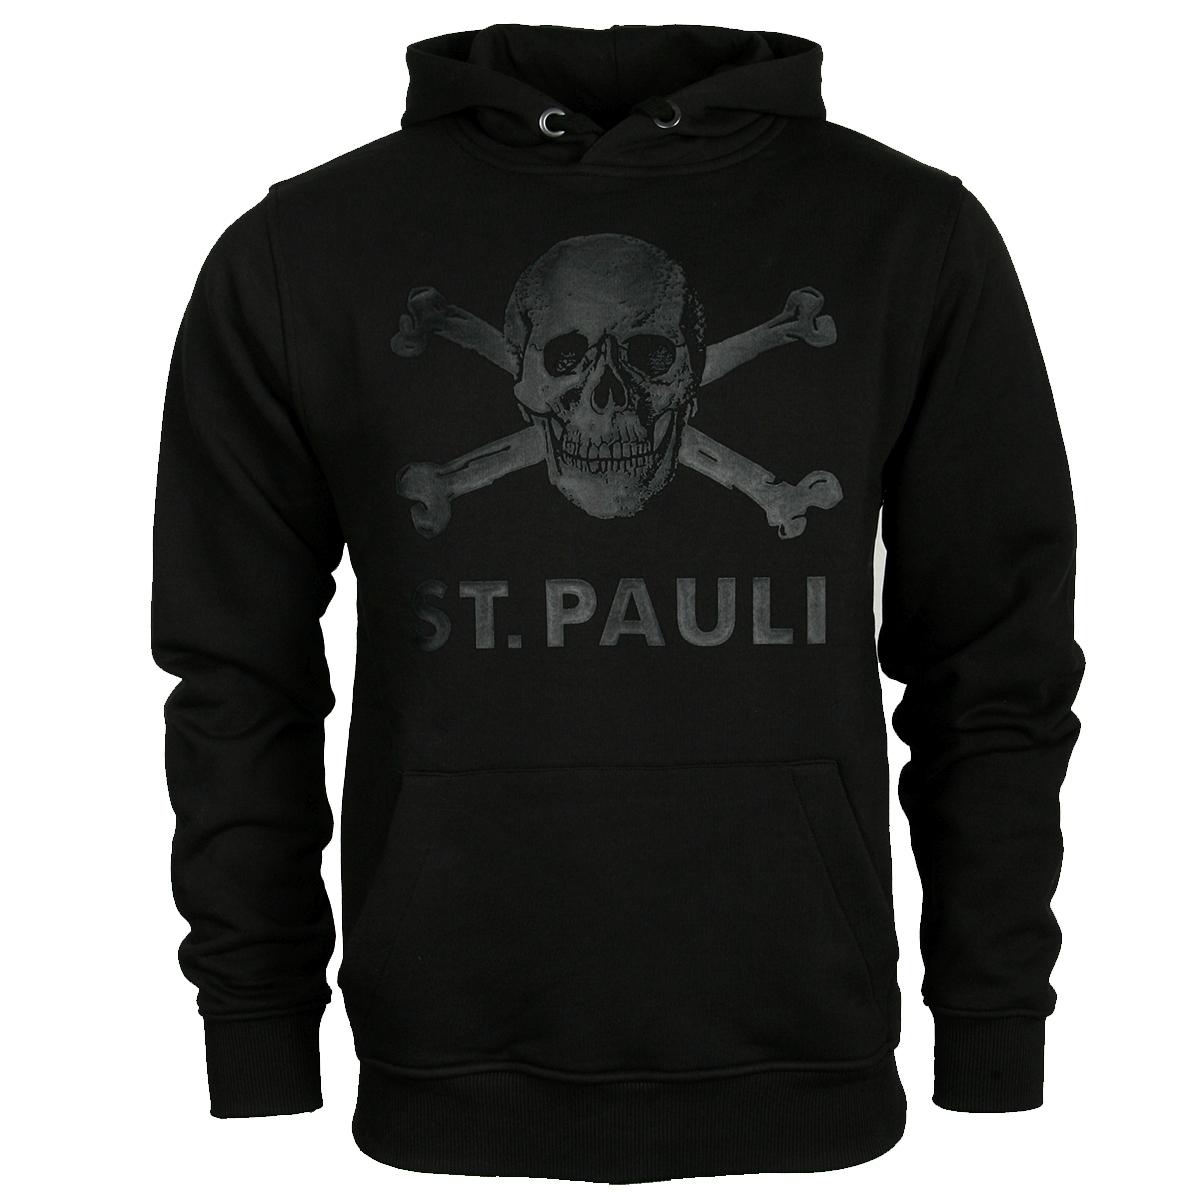 FC St. Pauli - Kapuzenpullover Black Matte Totenkopf - schwarz